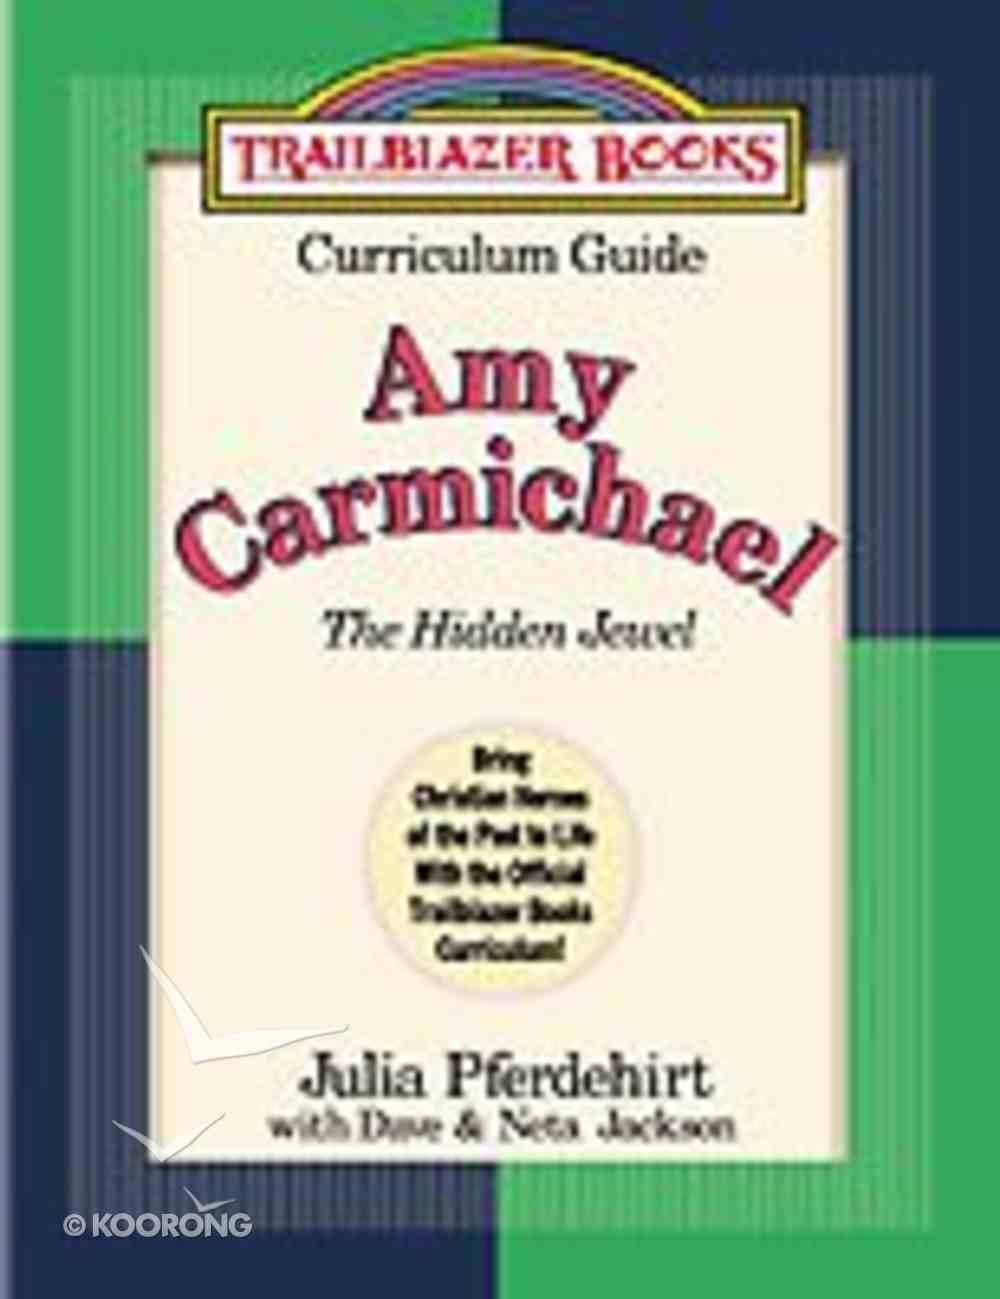 Trailblazer Curriculum Guide #02: The Hidden Jewel Paperback